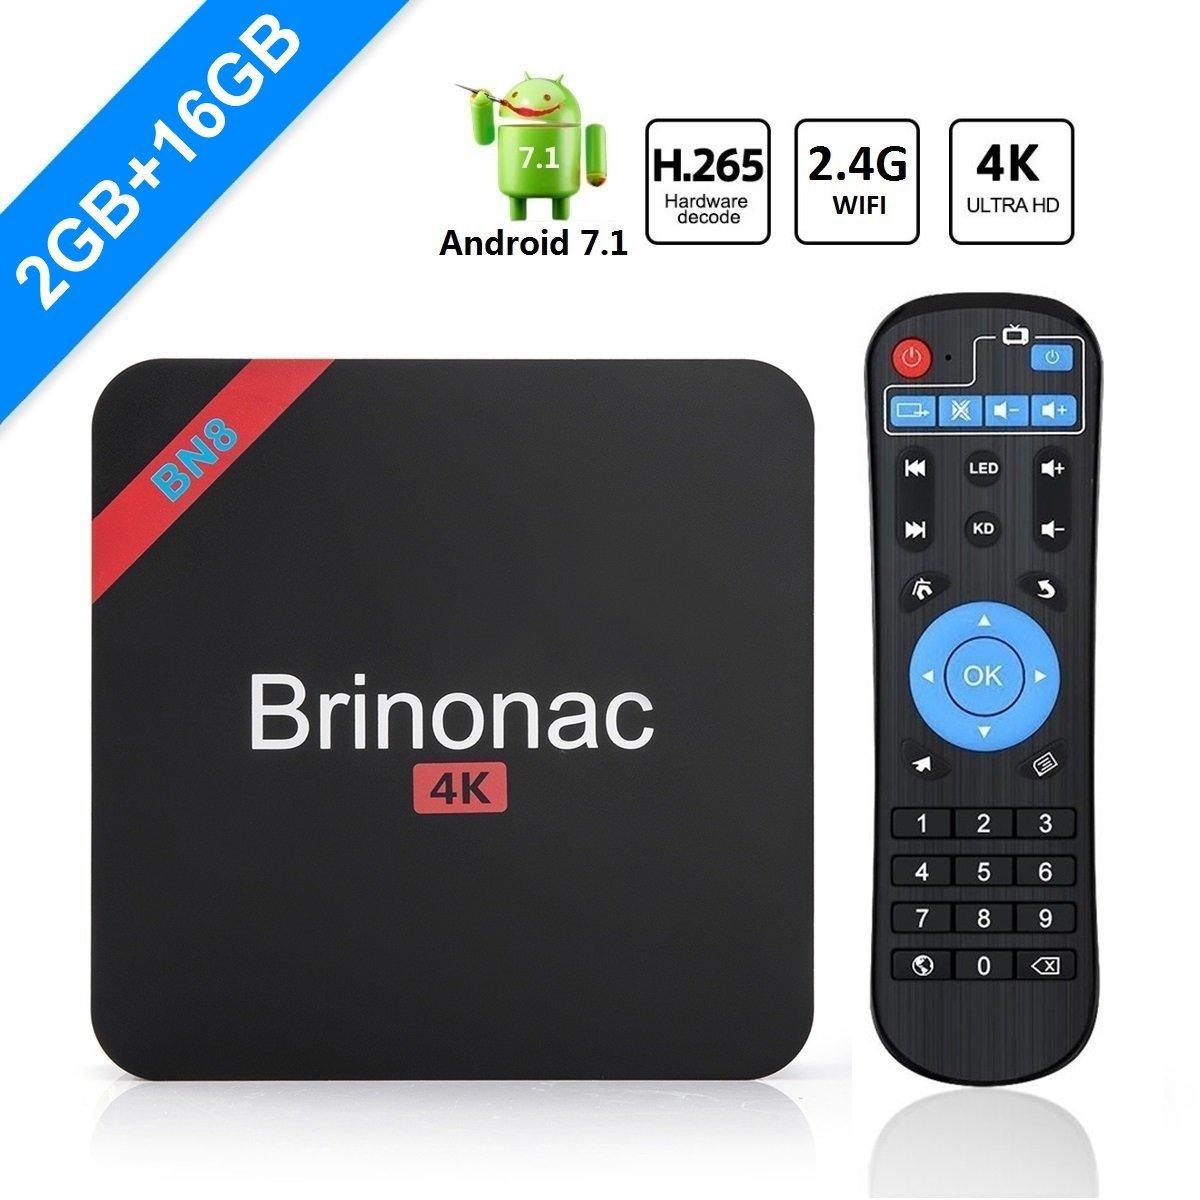 GULEEK BN8 4K HD Smart Android 7.1 TV Box con Amlogic S905W Quad Core 2.4G Wifi 3D H.265 (2 GB +16 GB) GLK-T95B-EU